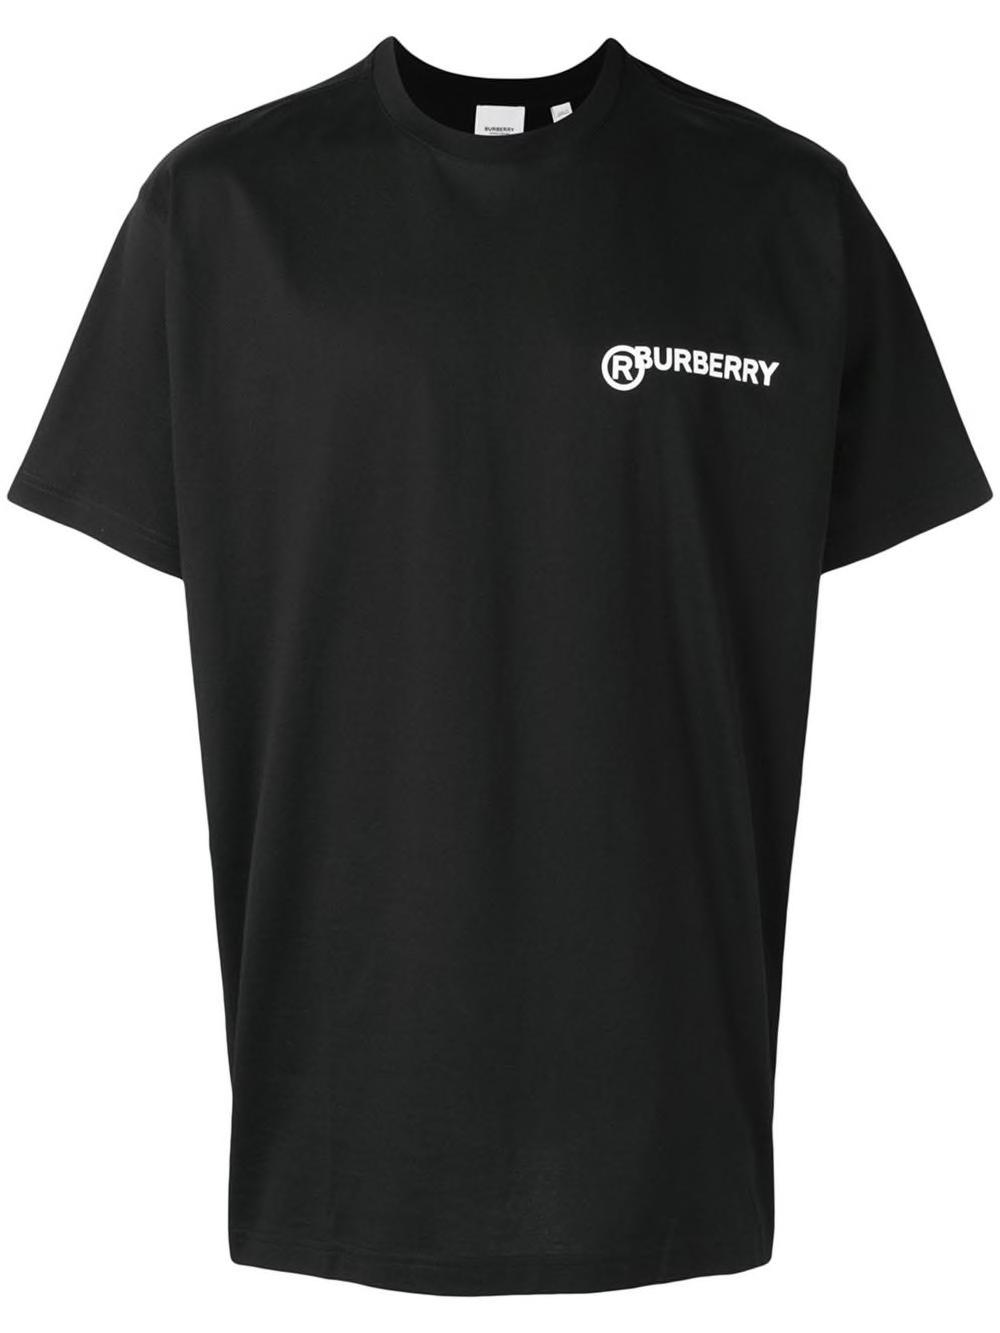 Tee-shirt oversize -